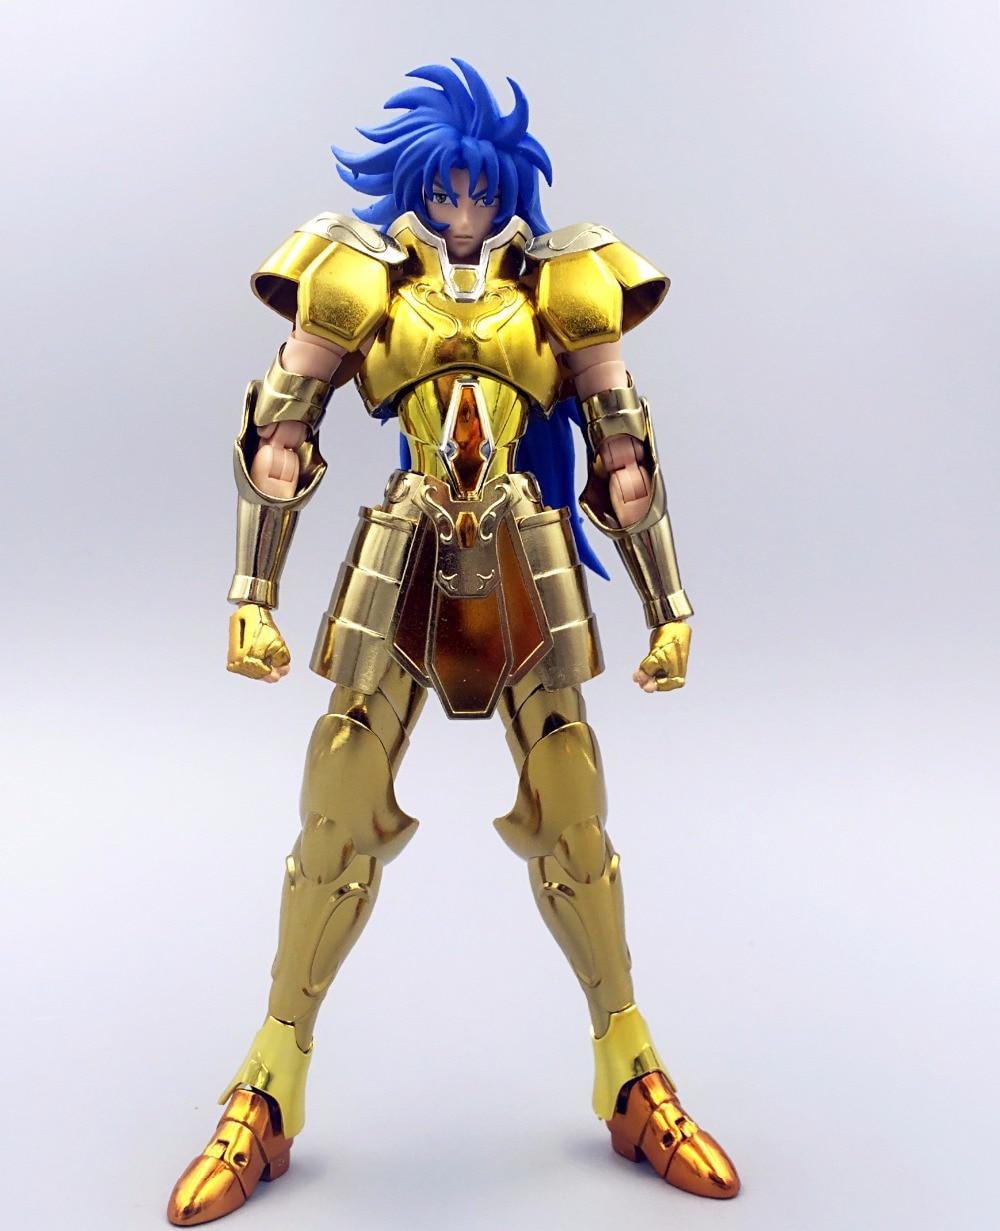 ST S-Temple (MC Metal Club) Saint Seiya Cloth Myth EX Gold Gemini Saga model metal cloth